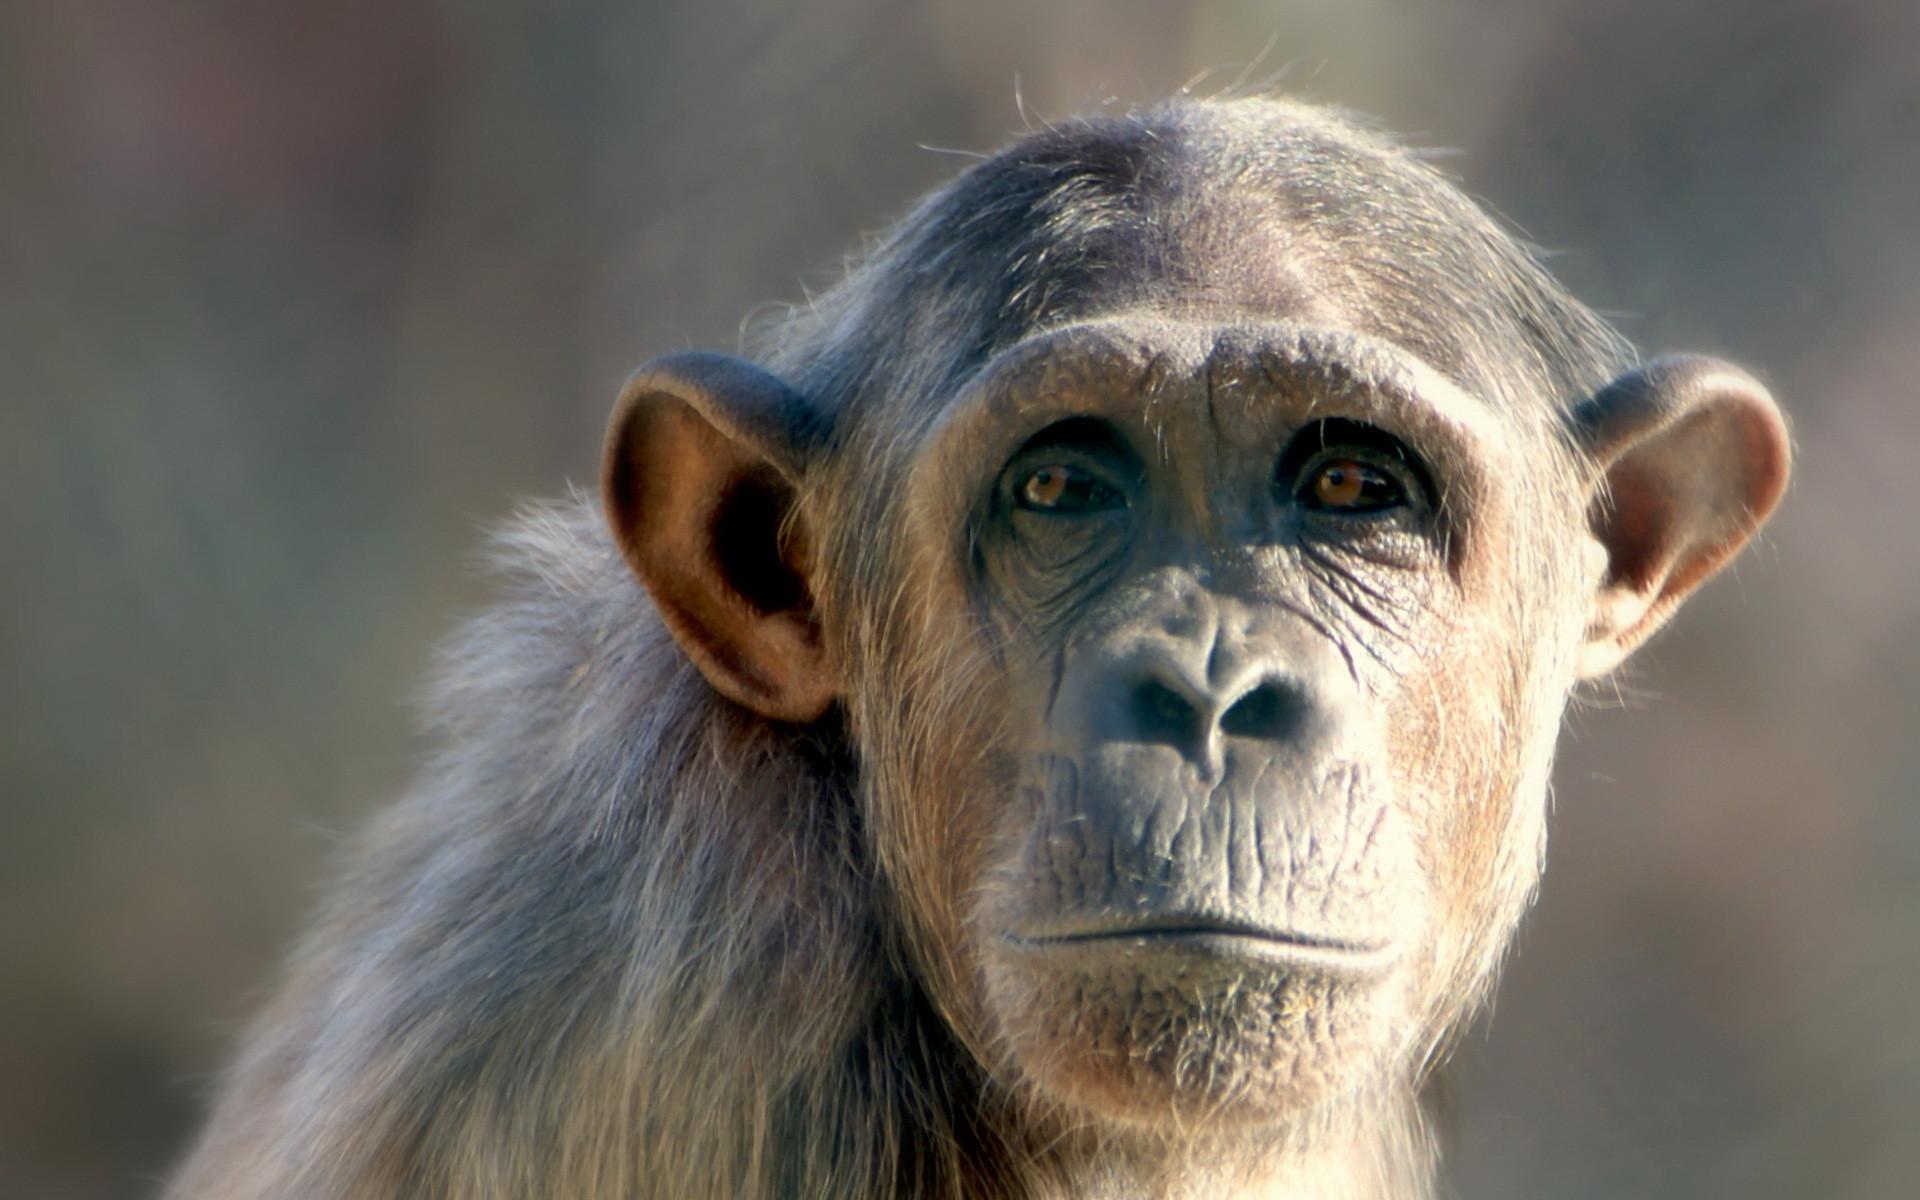 Monkey Hd Wallpaper 58 Images